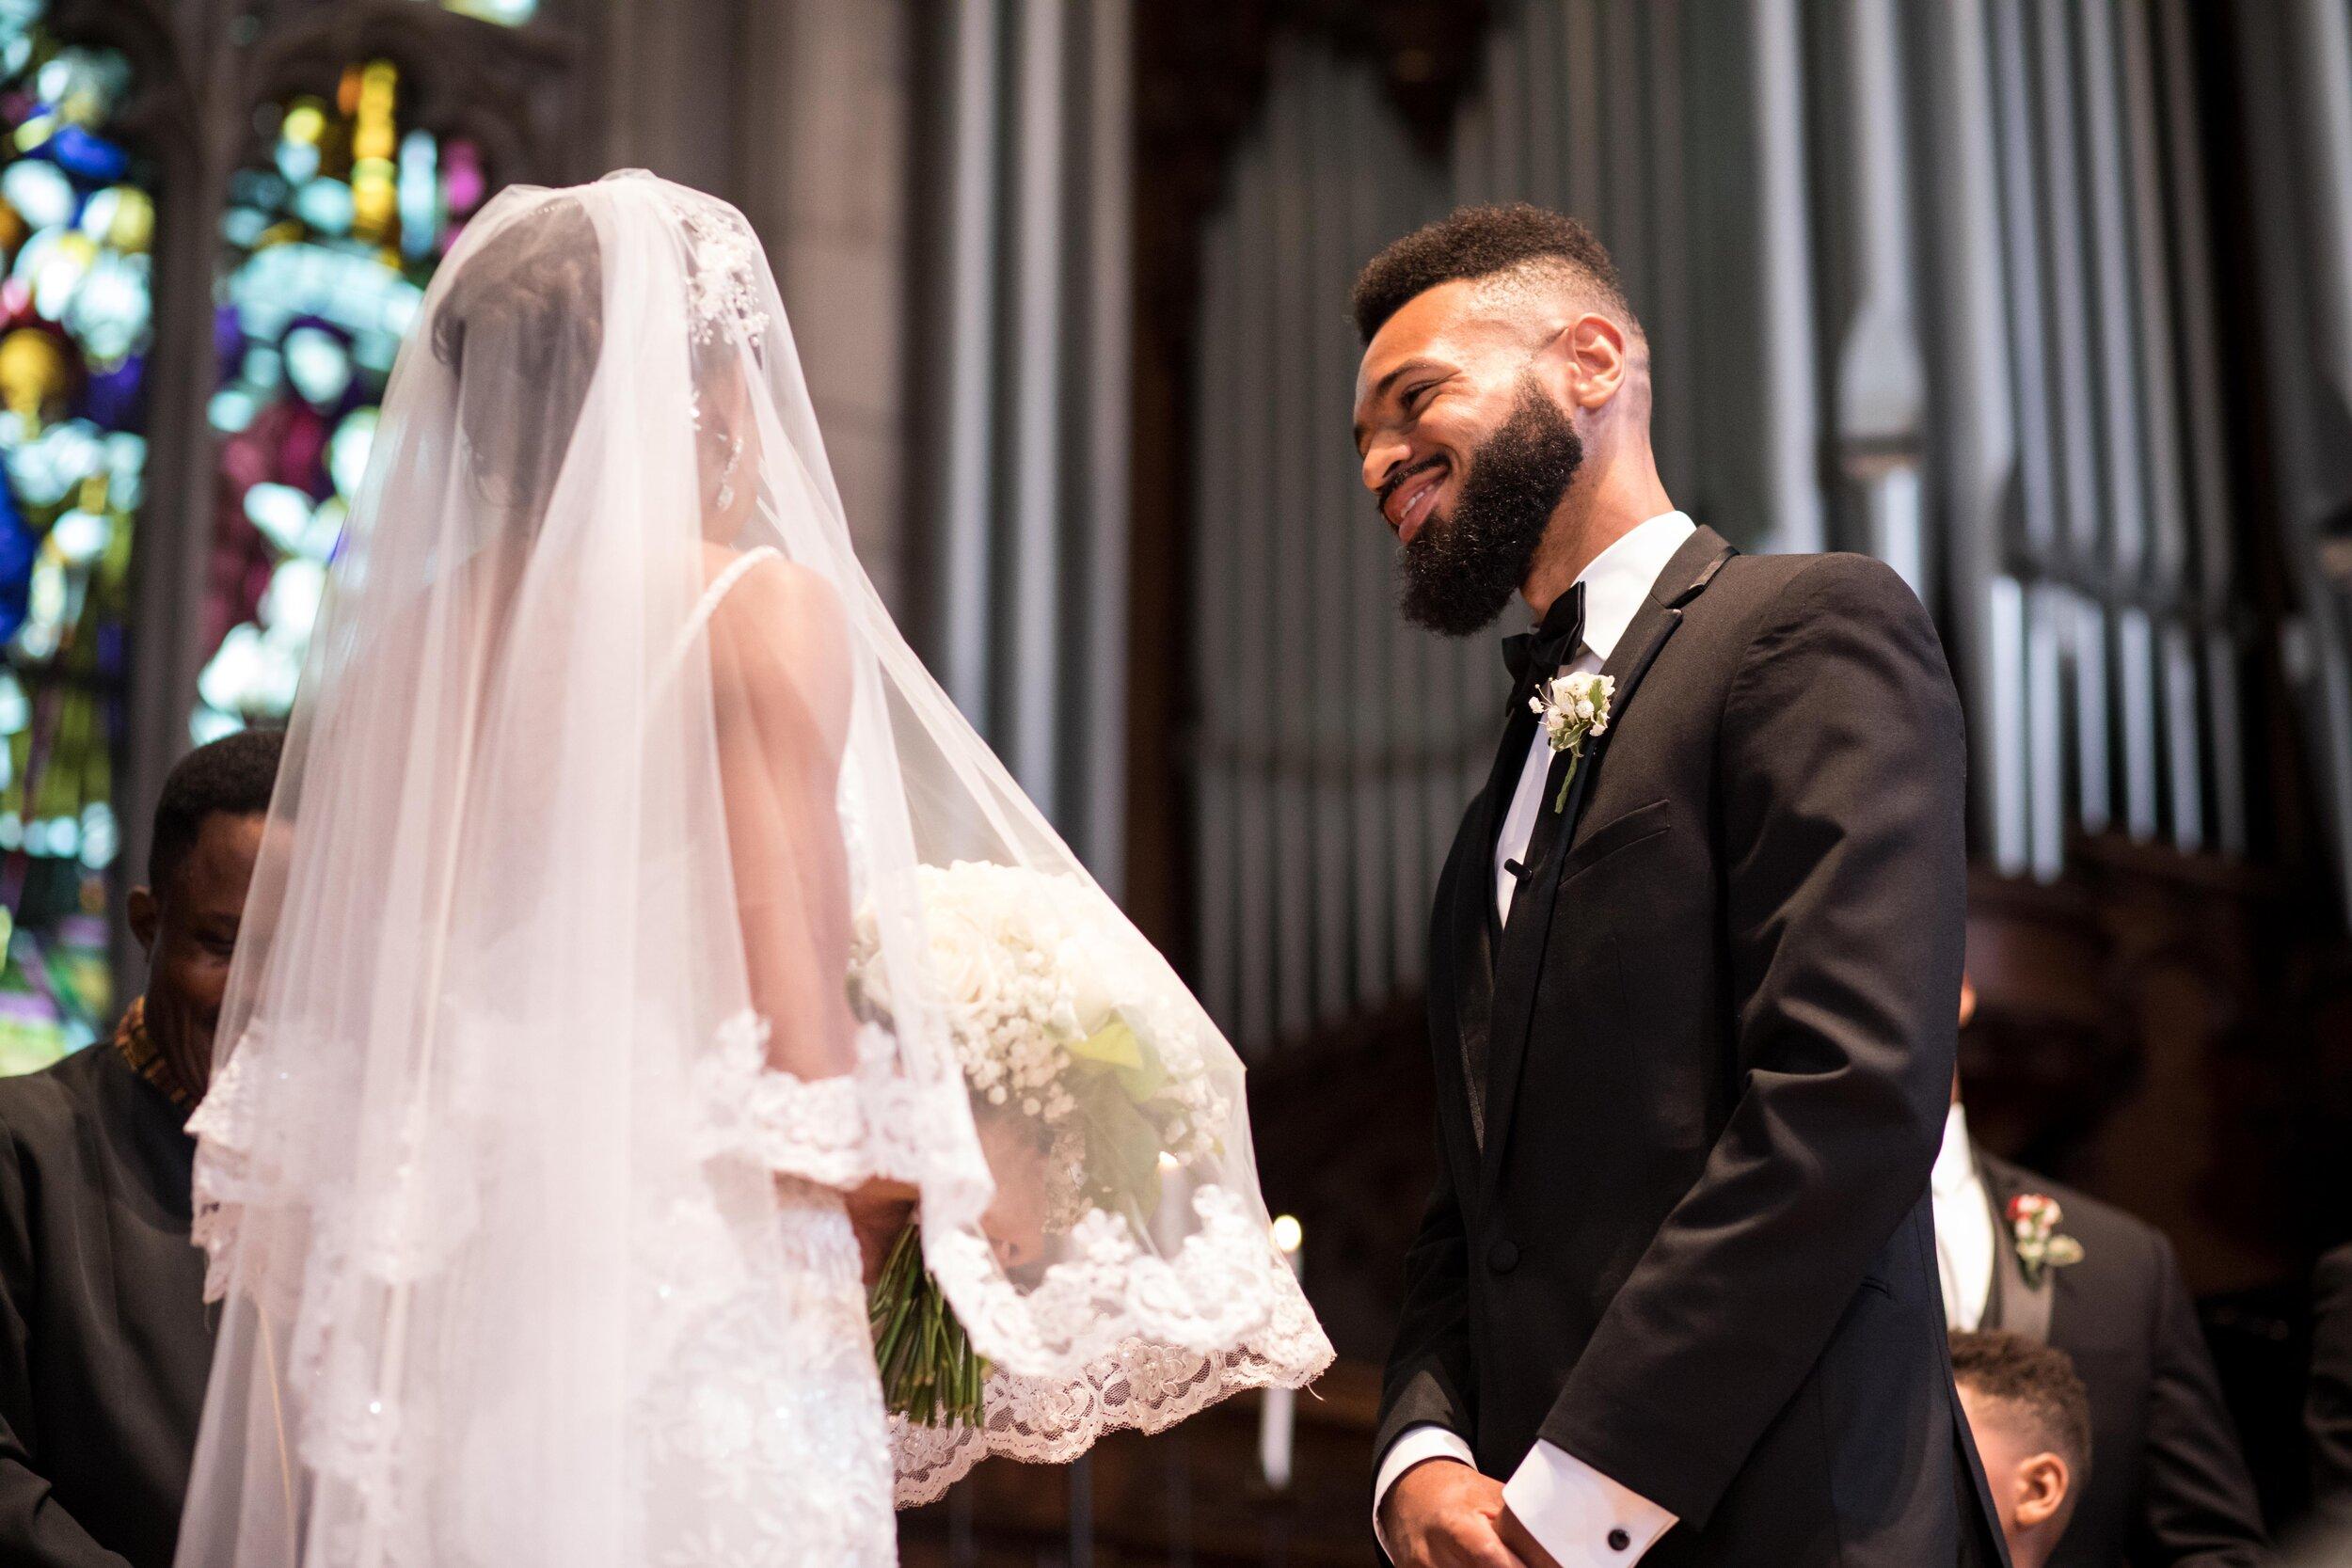 8_3_2019_BONTY_WEDDING-340.jpg